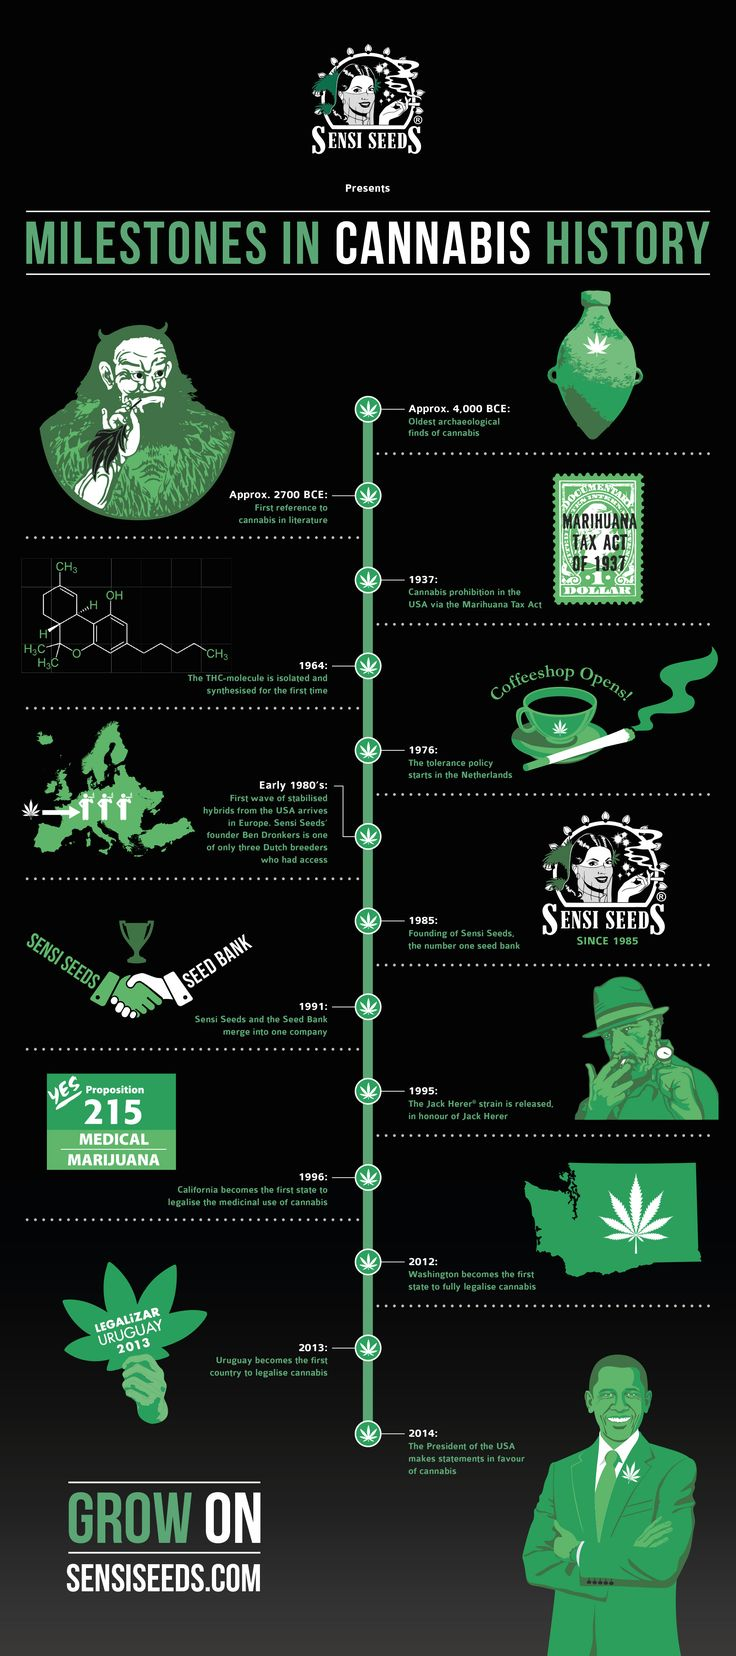 Know you're history. Cannabis Timeline - Sensi Seeds Blog | Cannabis | Pinterest | Cannabis, Weed and Hemp